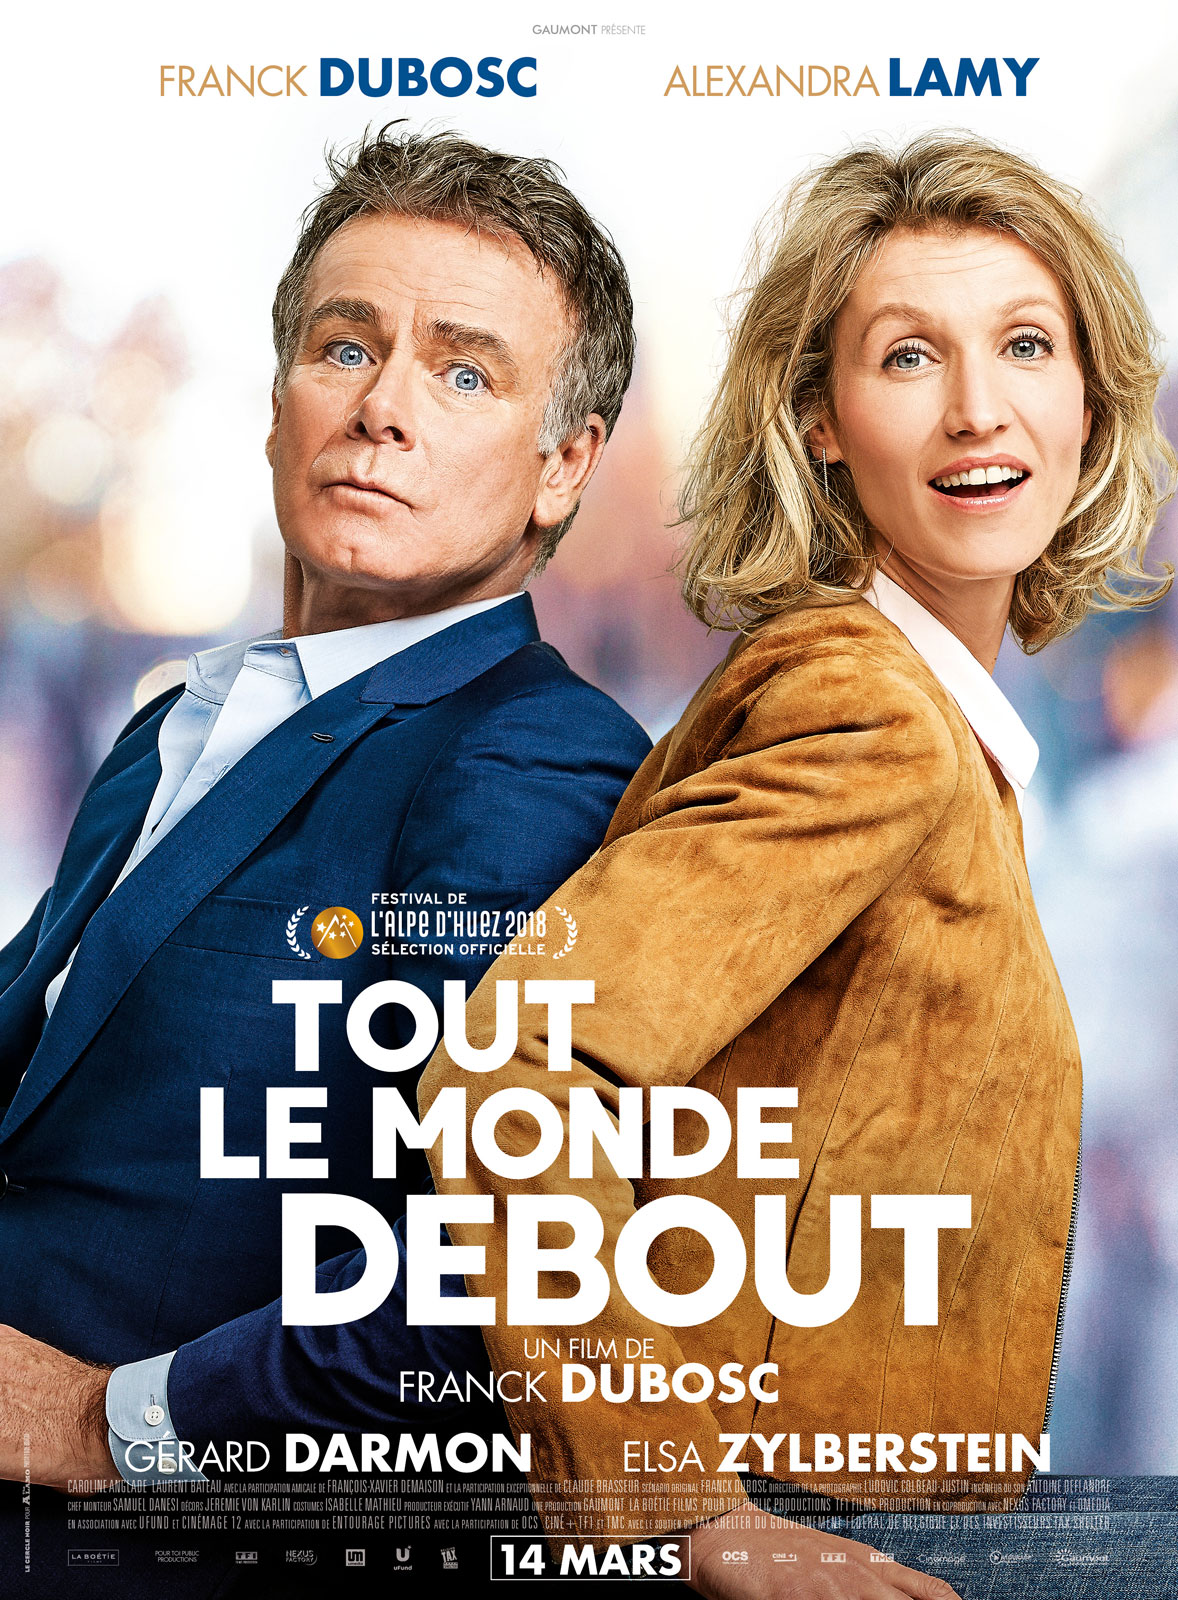 http://rss.allocine.fr/~r/ac/cine/cettesemaine/~3/29jKyHIMkLI/fichefilm_gen_cfilm=255532.html